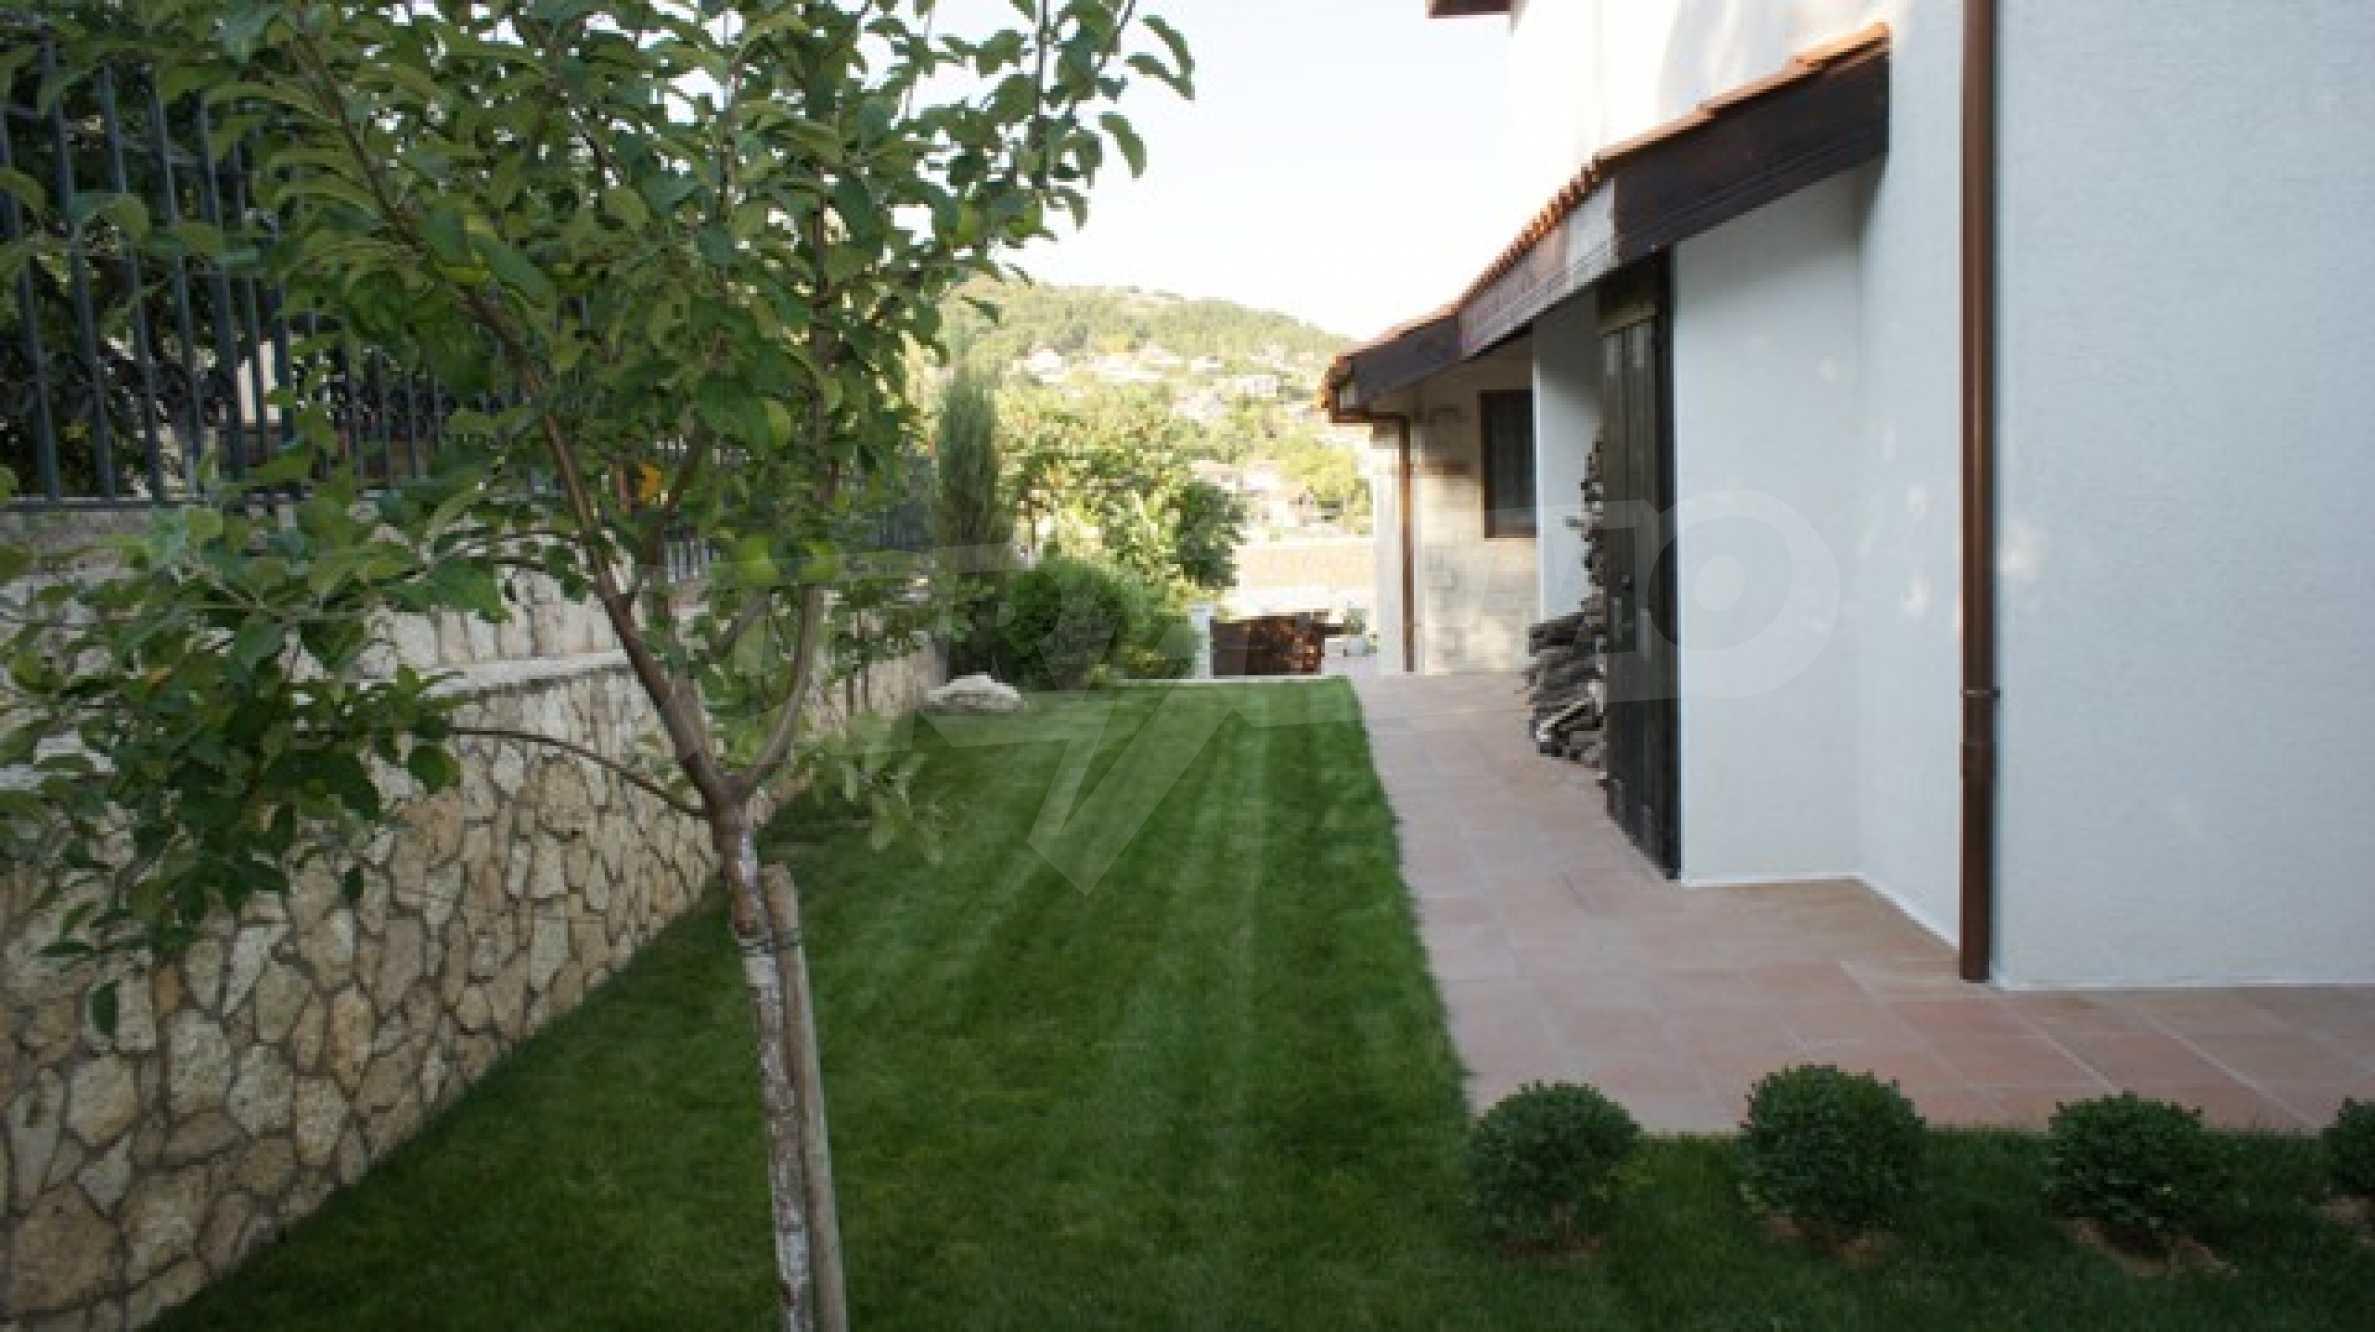 The Mediterranean style - a sense of luxury 13